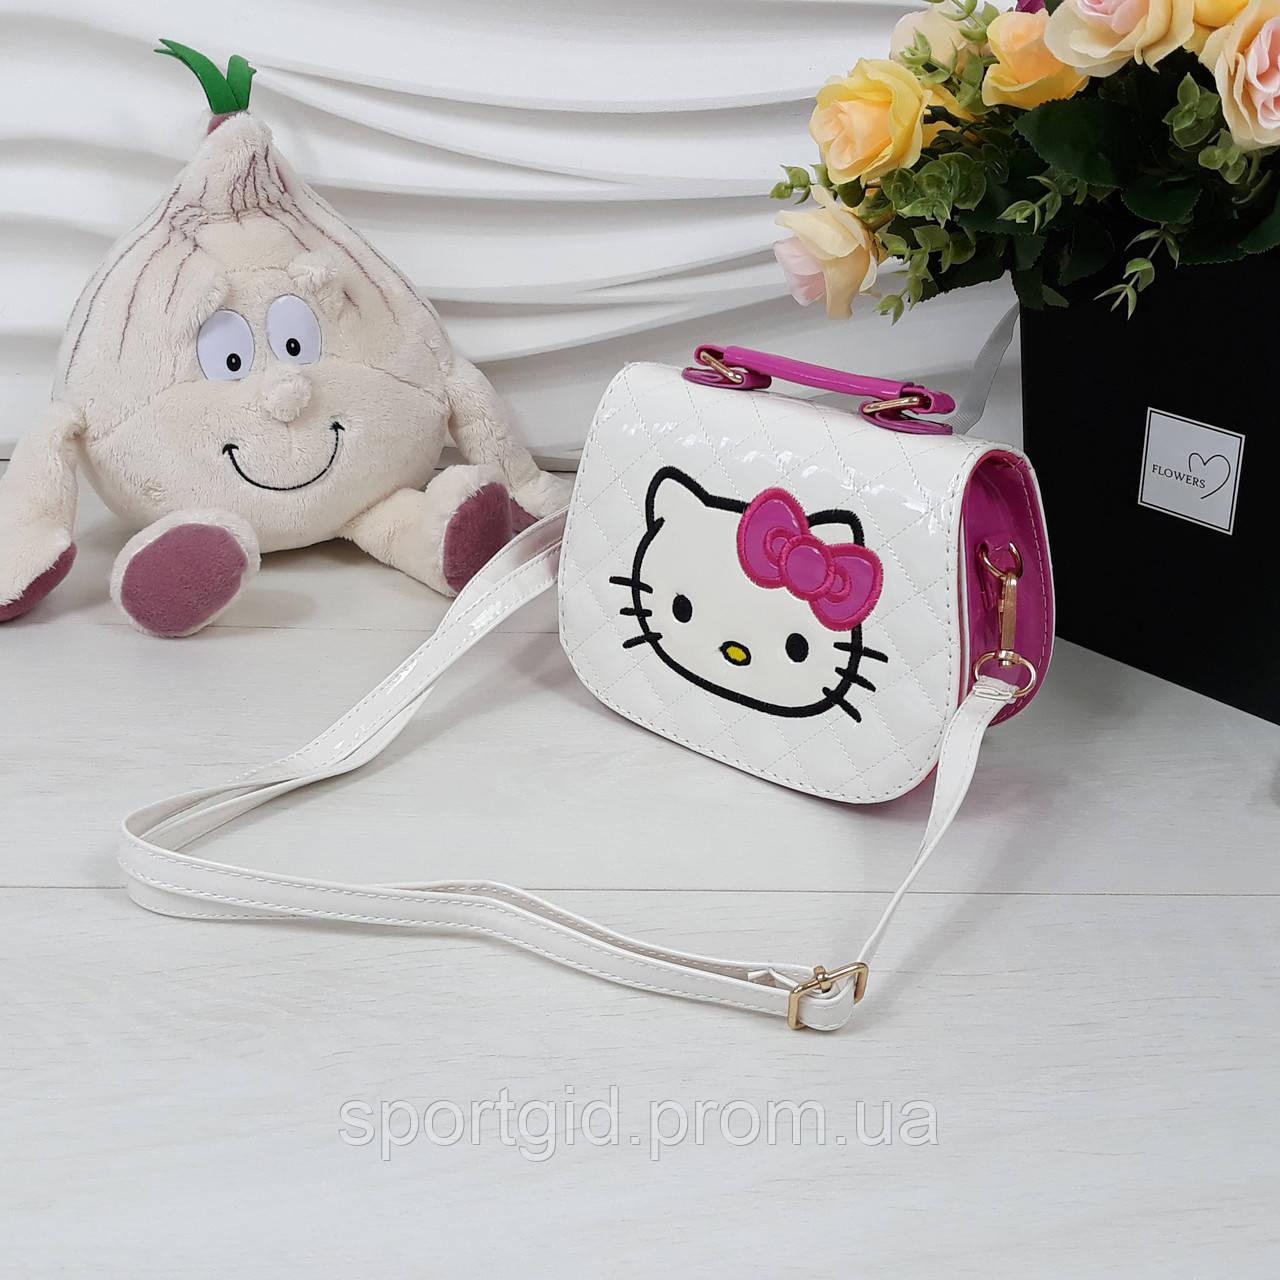 d1a57a020e8b Сумочка детская на плечо Hello Kitty для девочек - Интернет магазин ShopoVik  в Запорожье